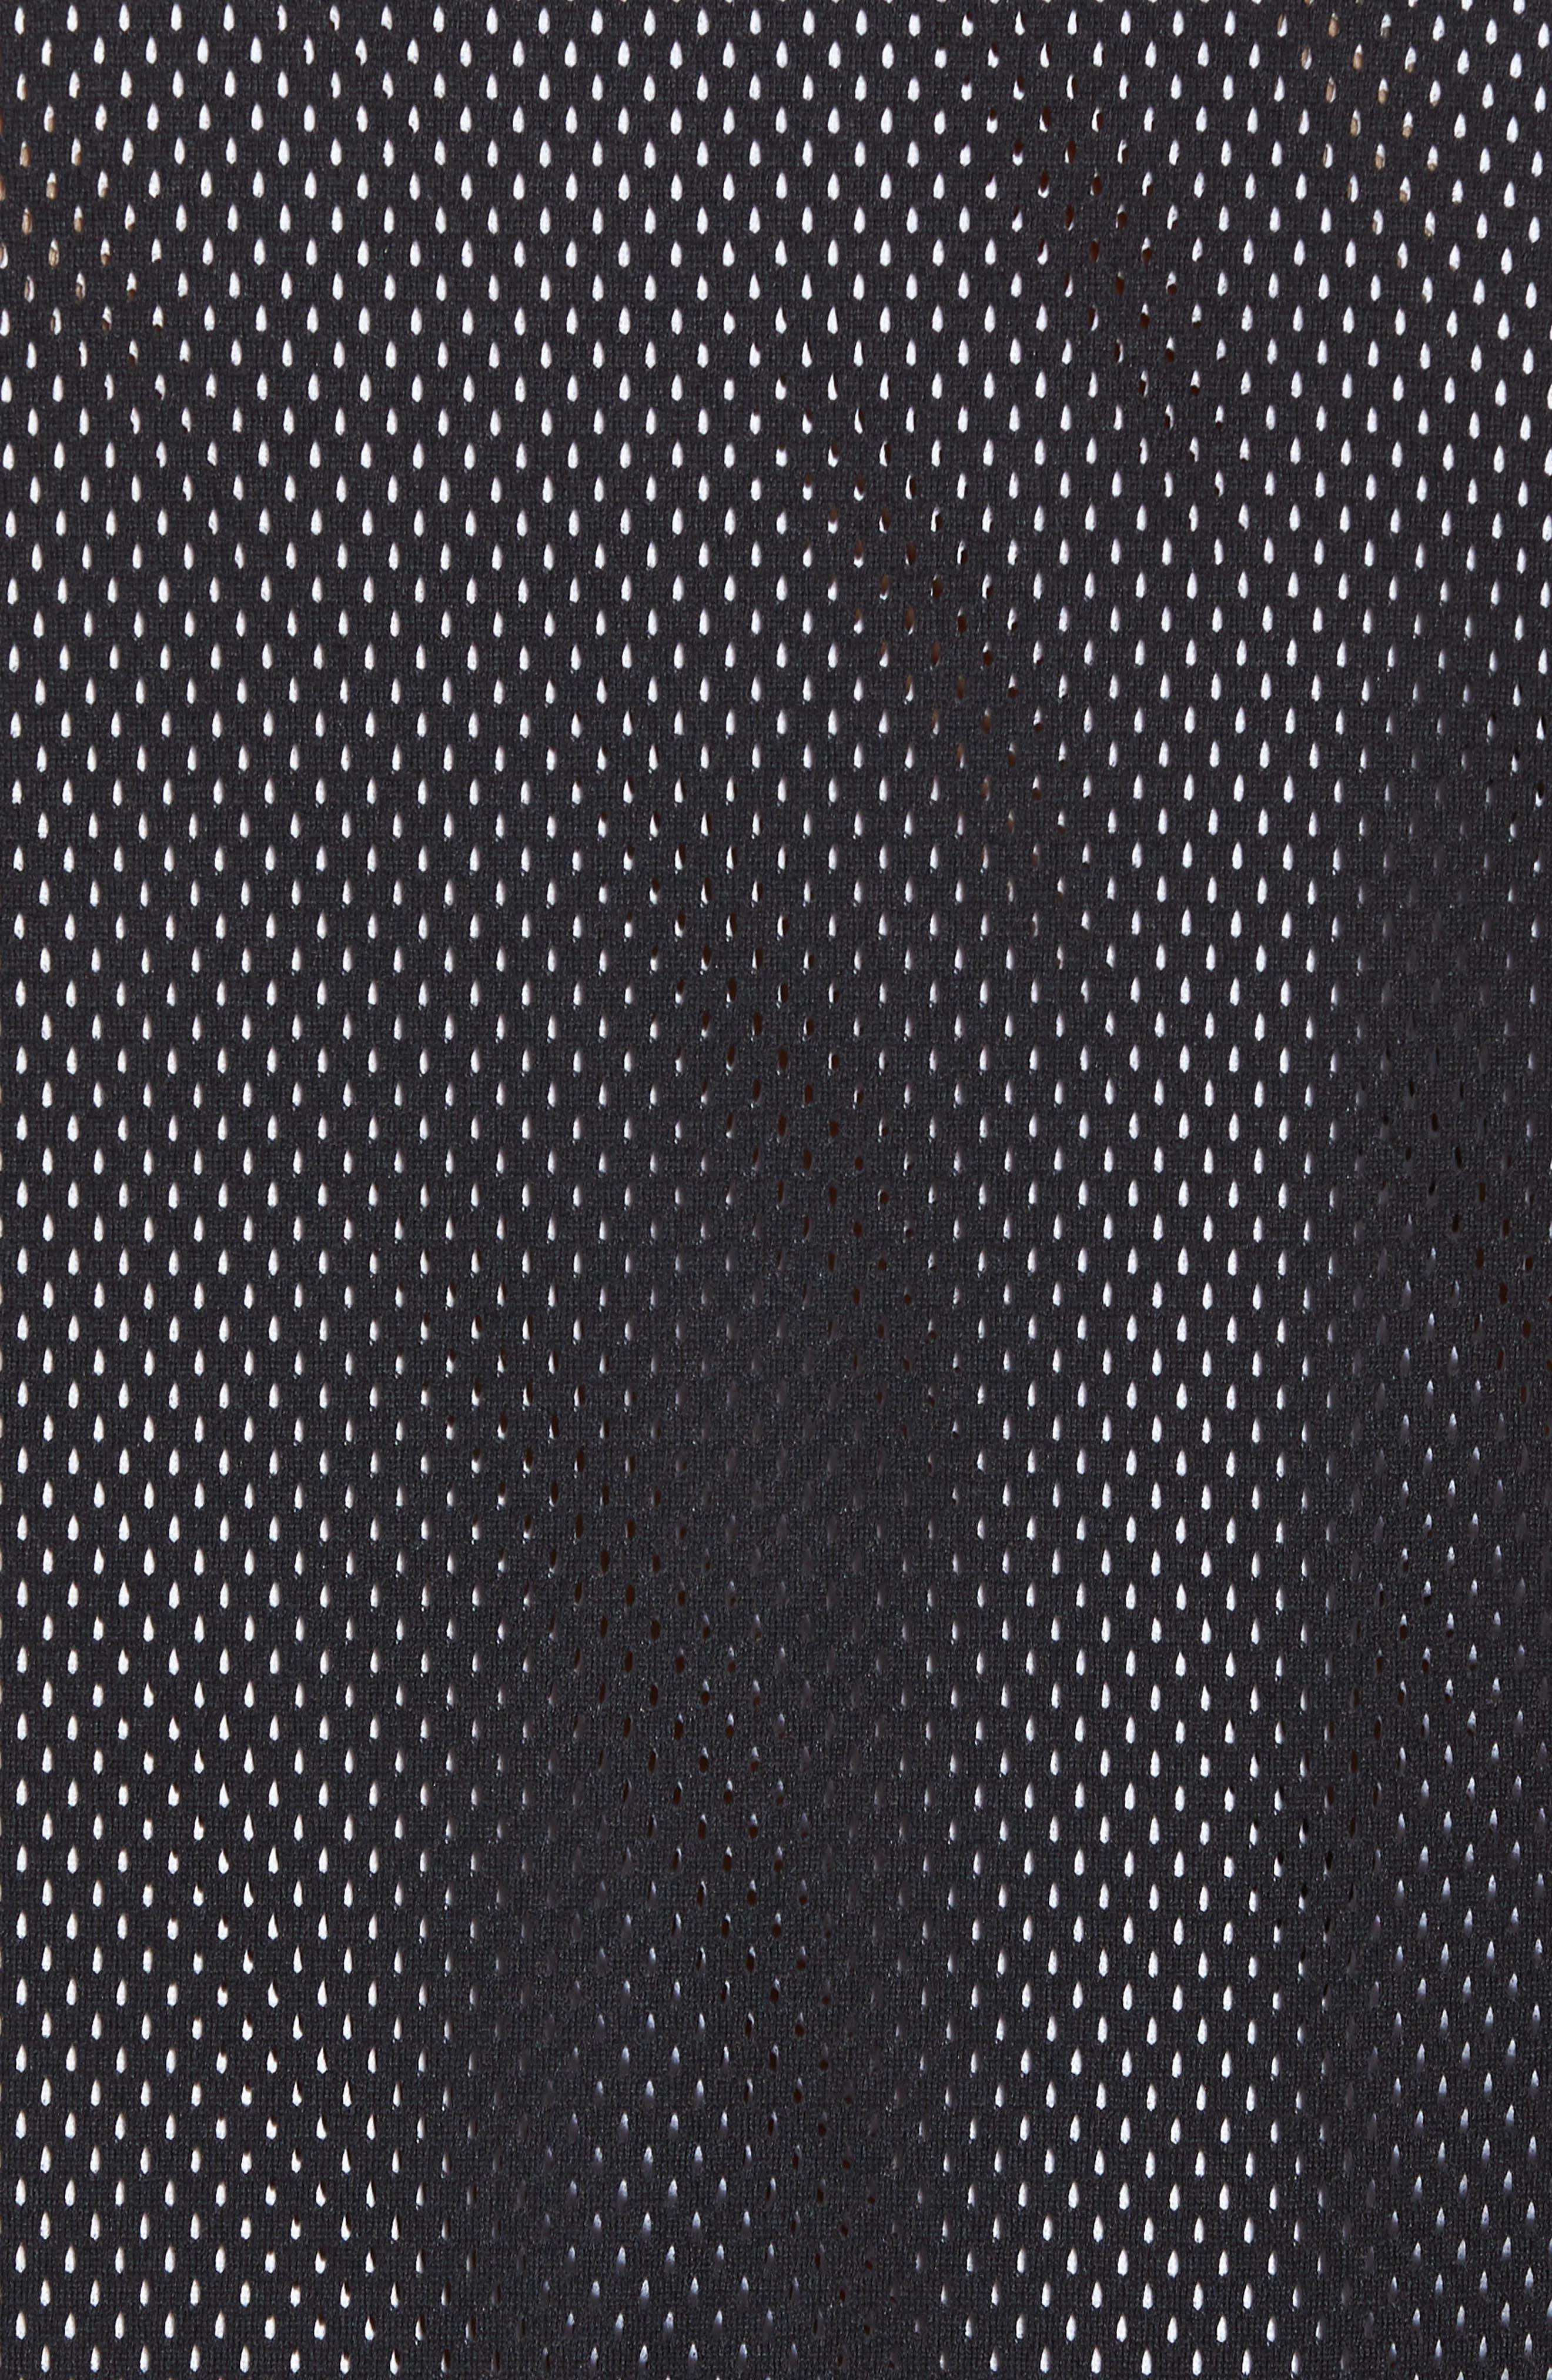 Sportswear Air Knit Tank,                             Alternate thumbnail 5, color,                             Black/ White